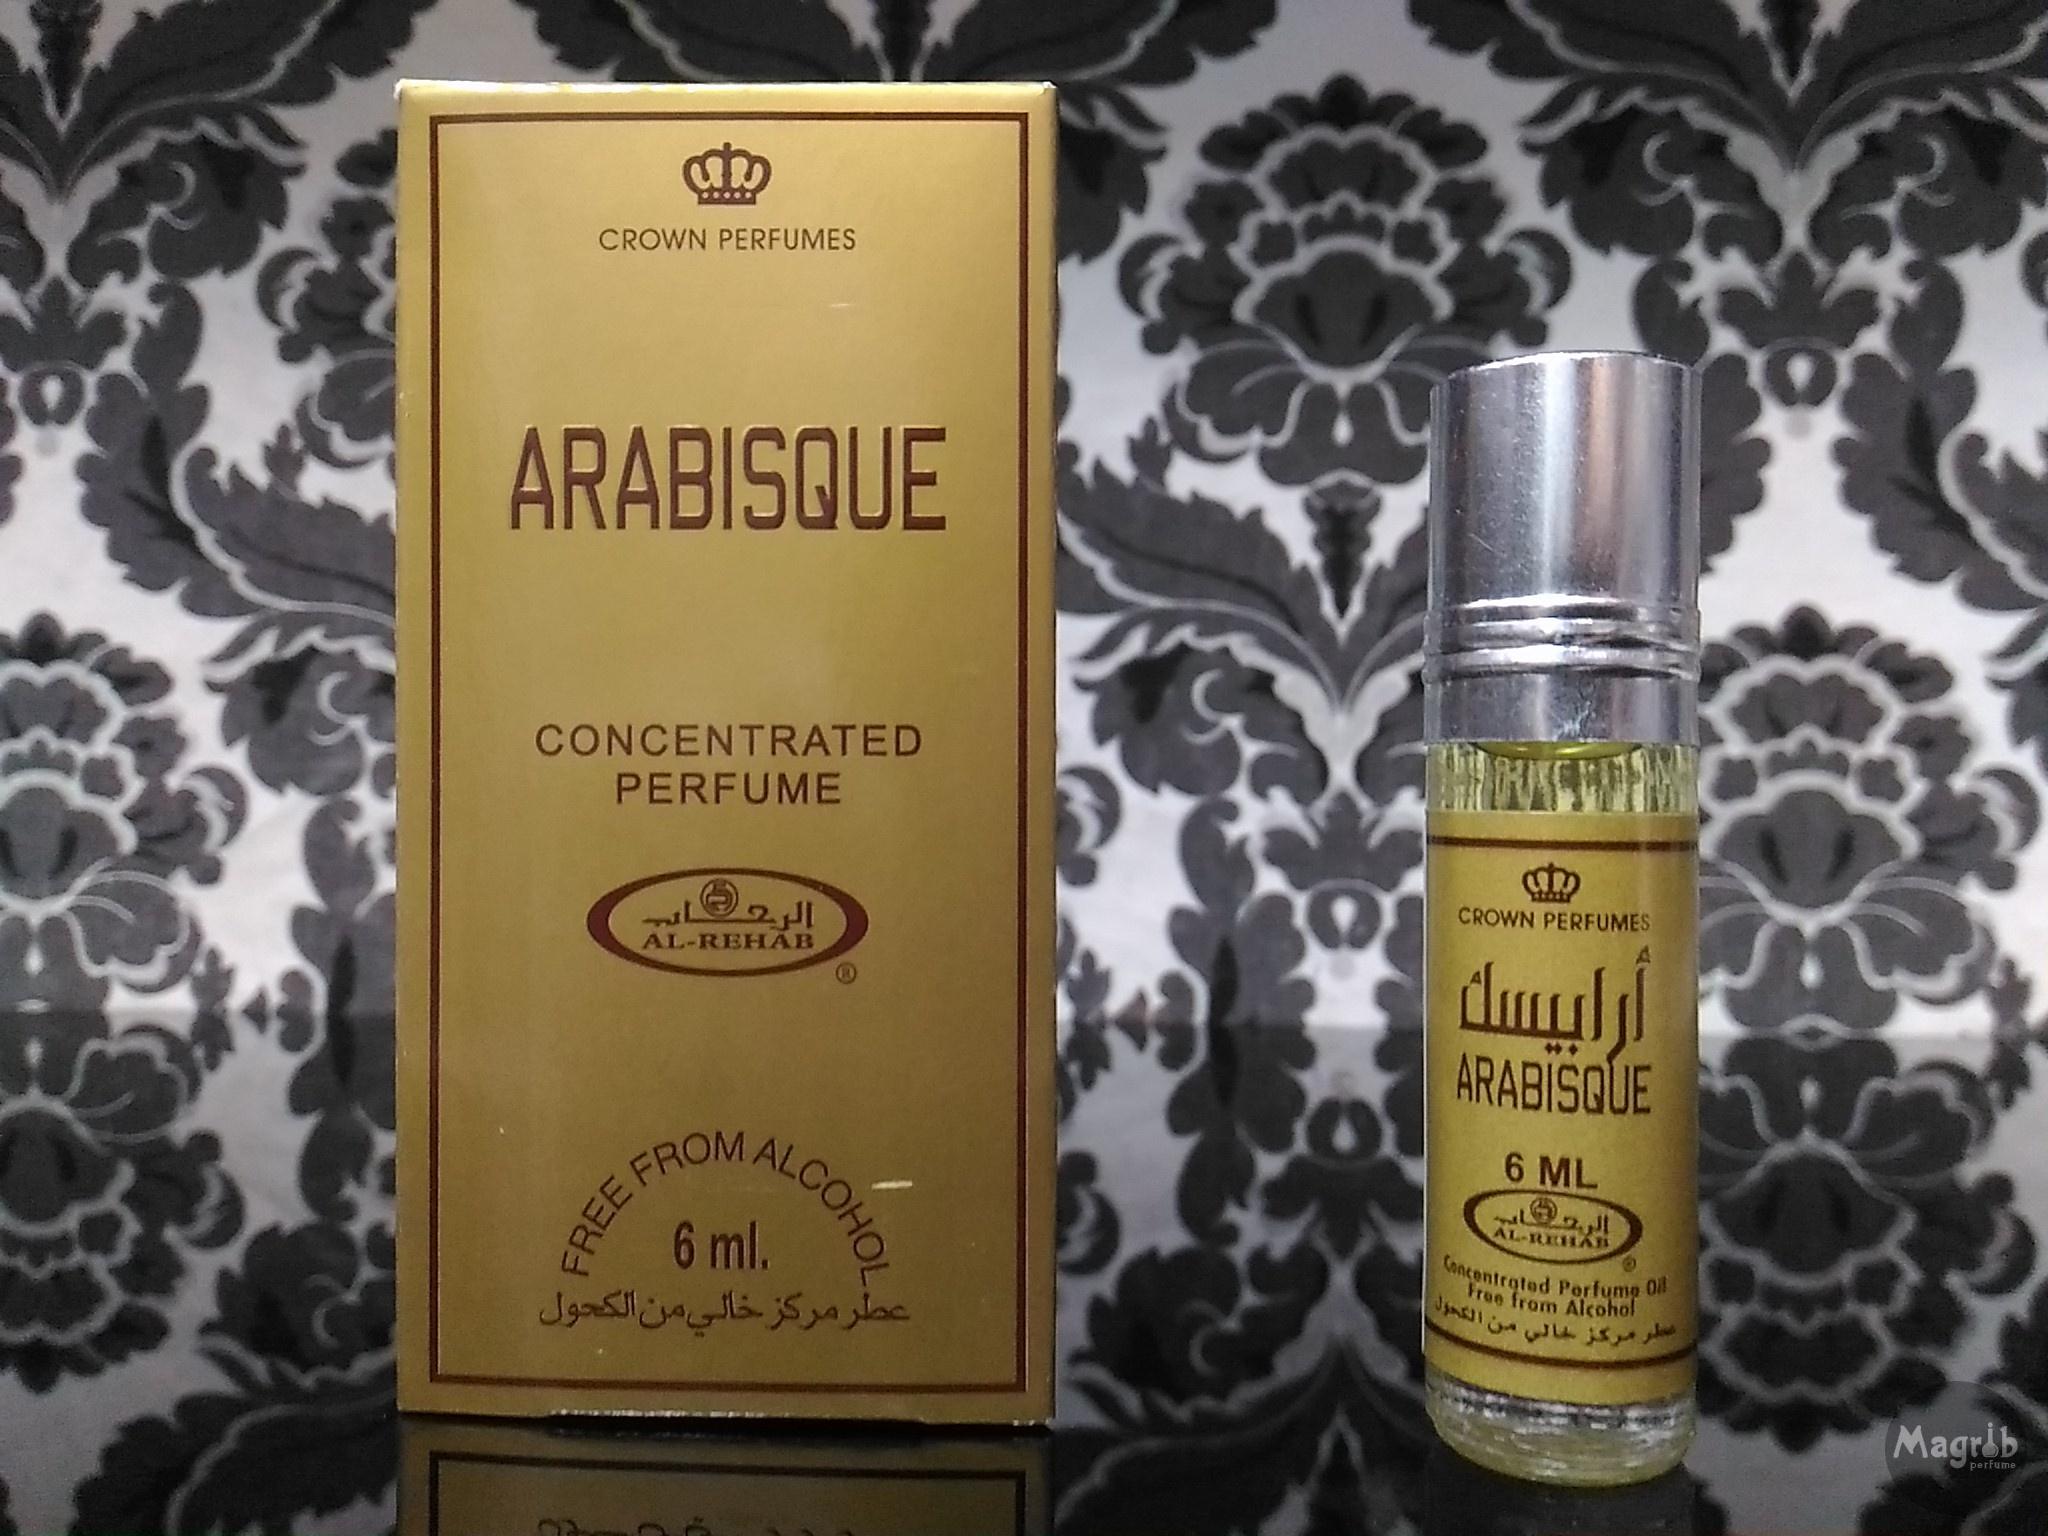 Al-Rehab Arabisque 6ml - женские масляные духи